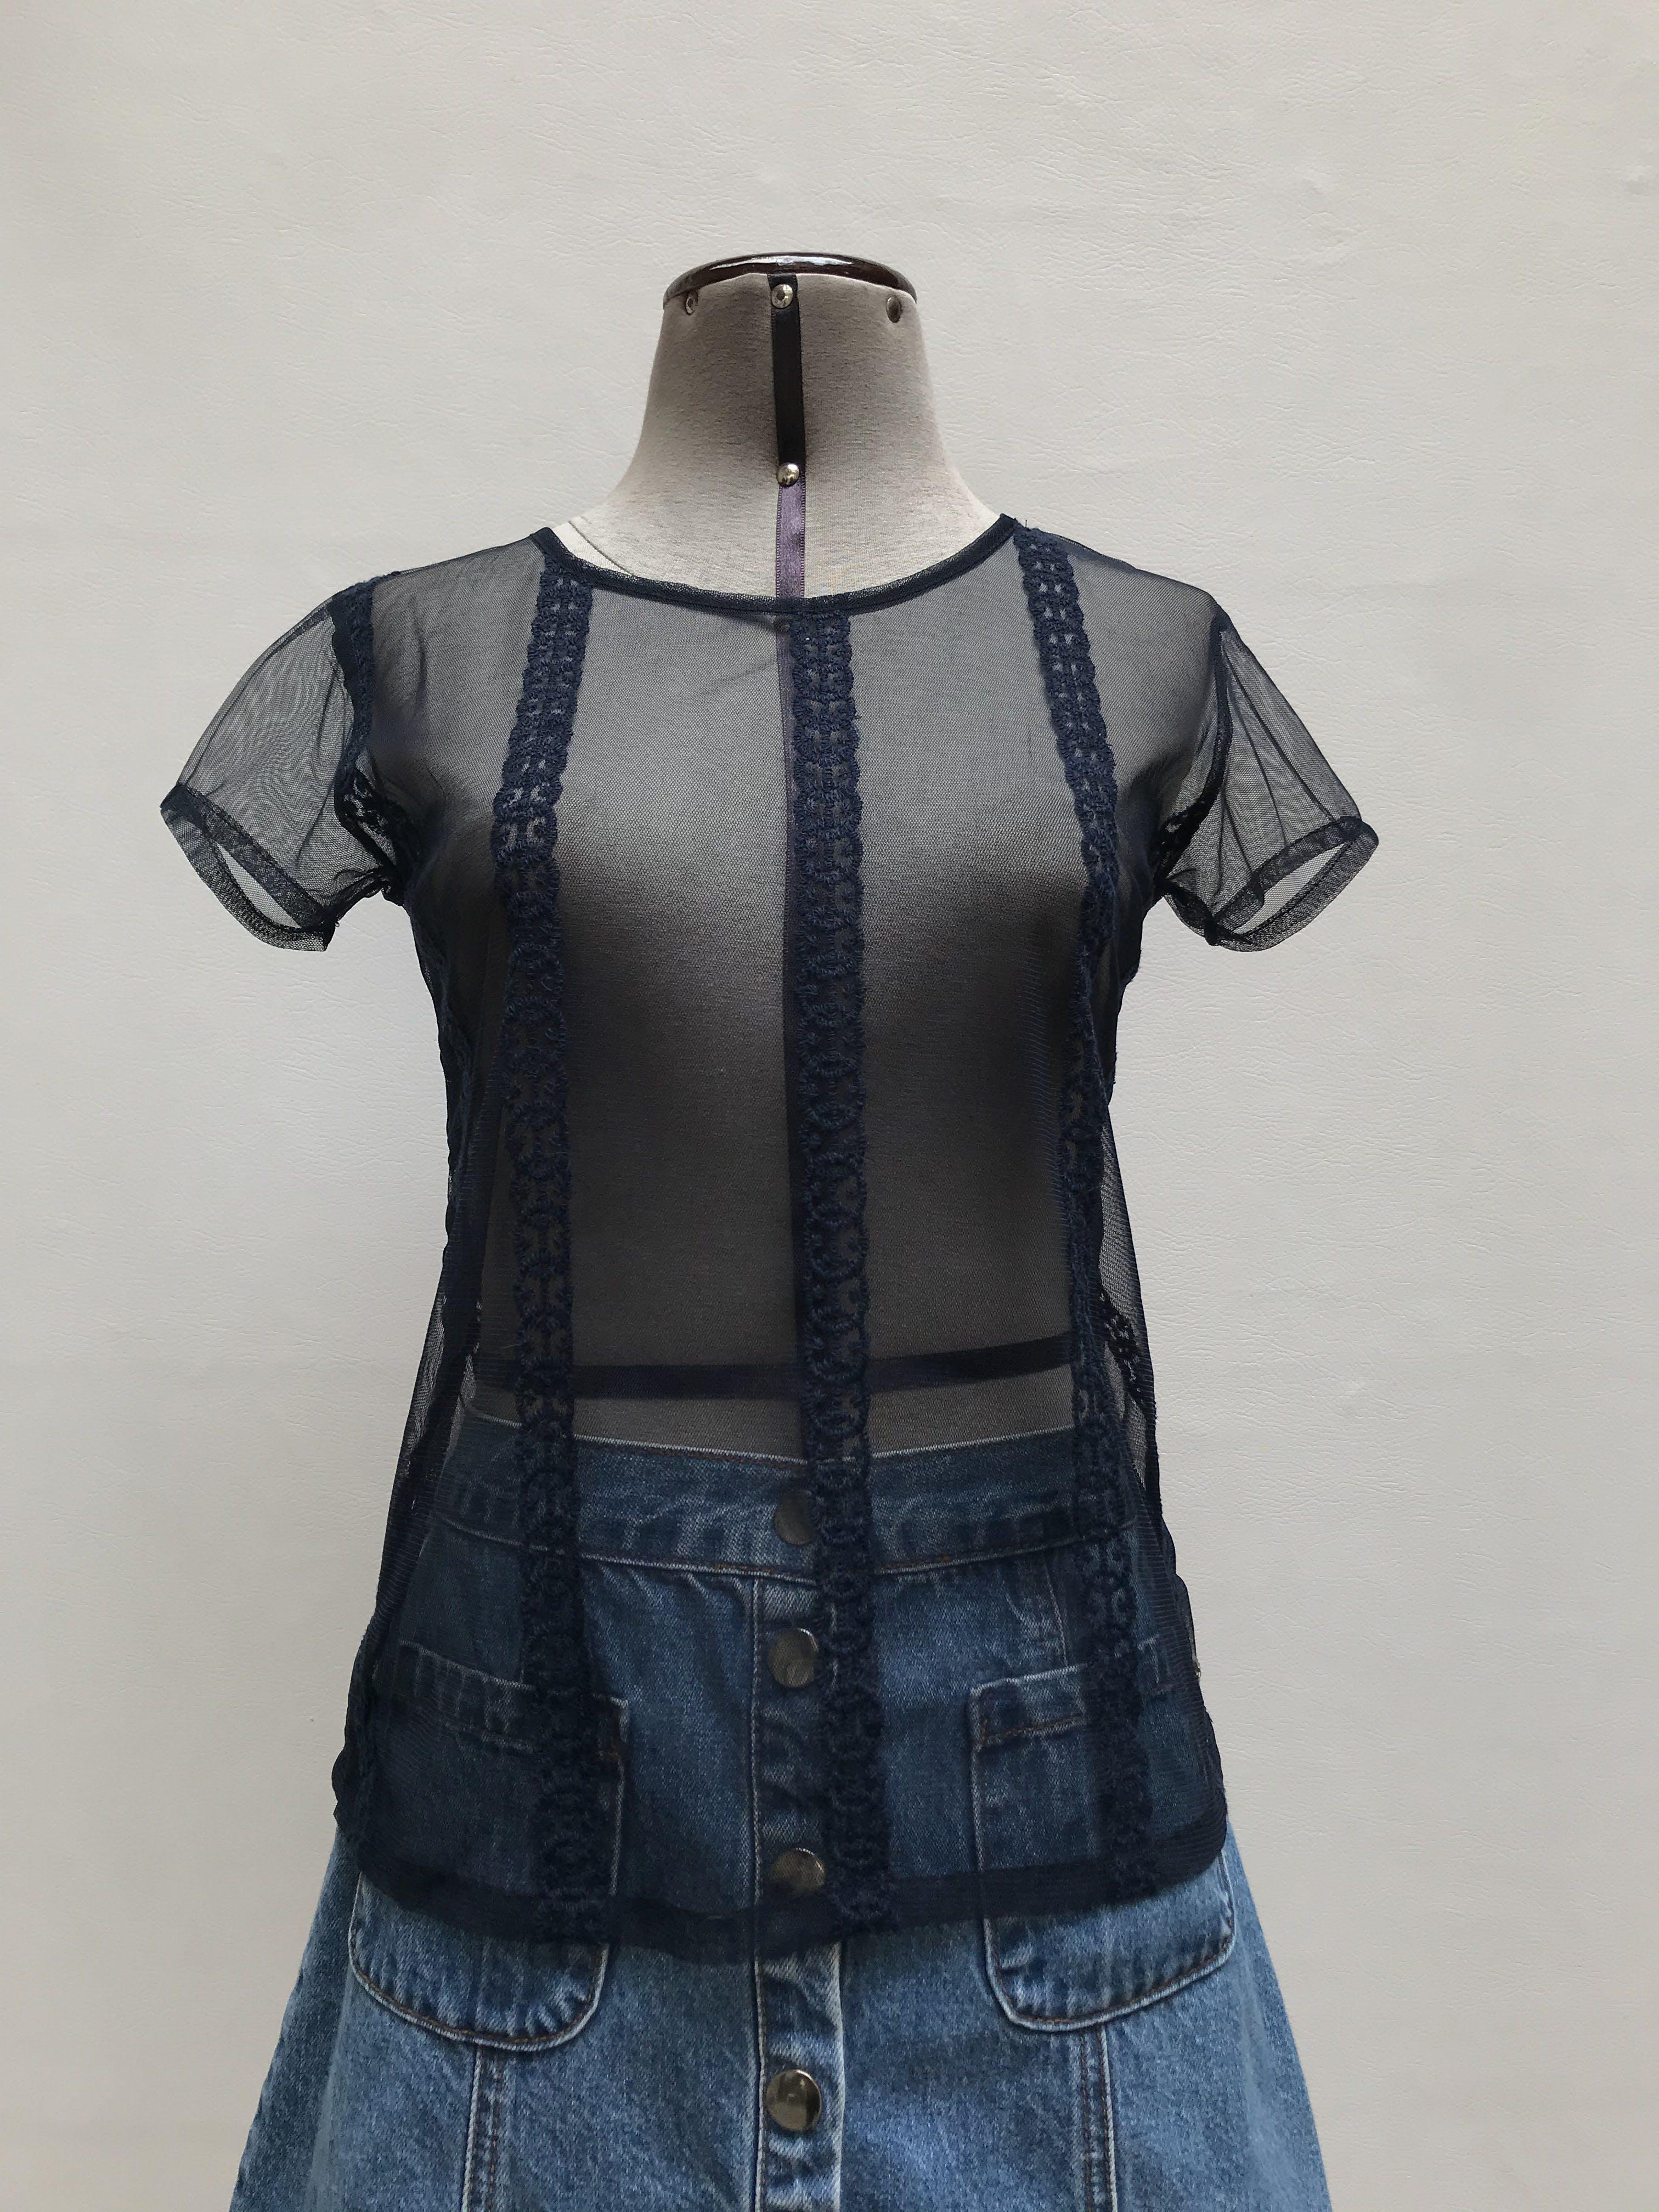 Blusa de tul azul con bordados verticales al tono, manga corta Talla XS